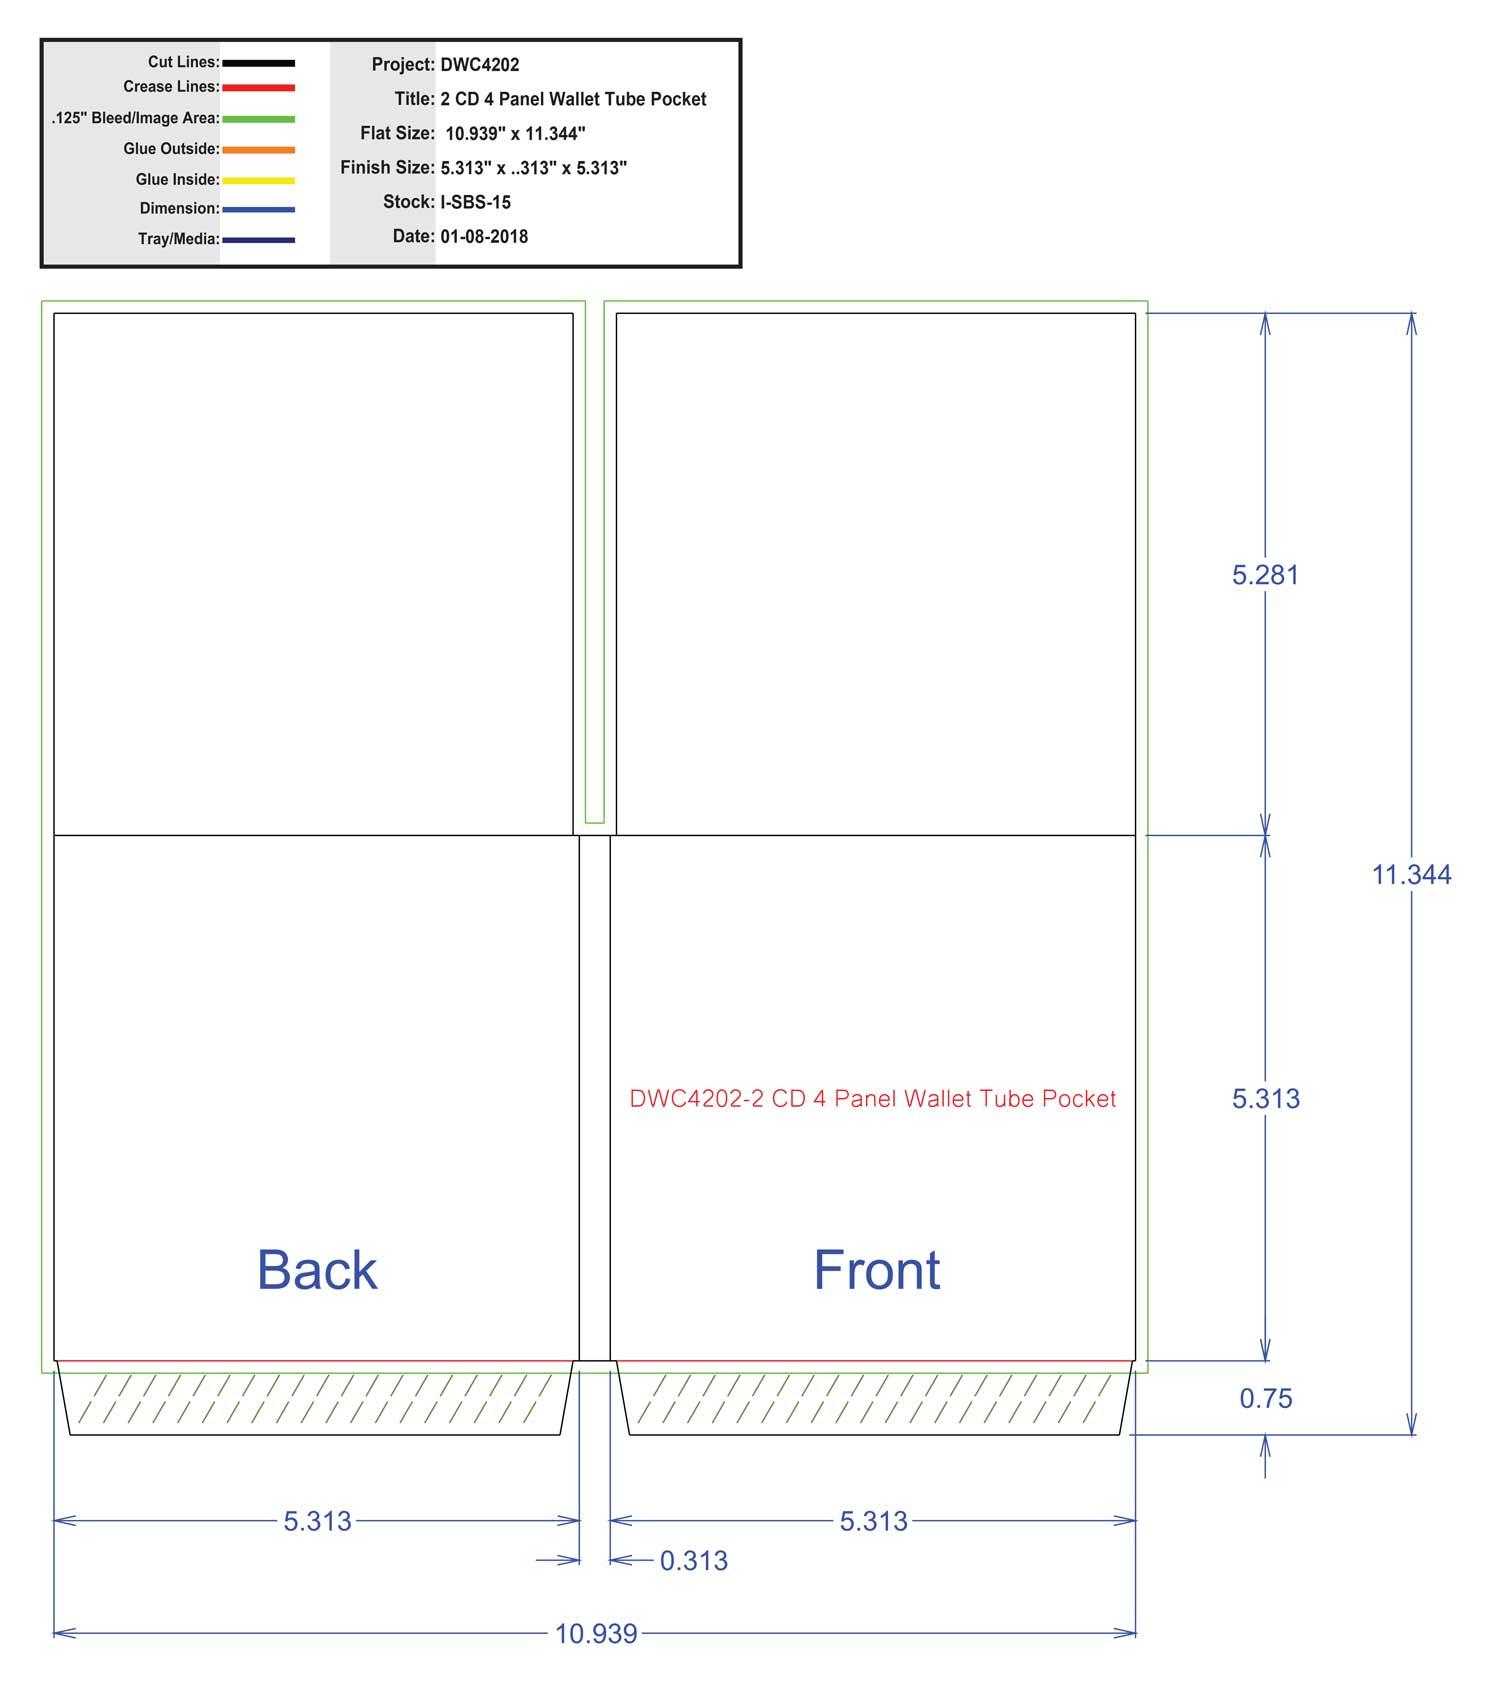 DWC4202-2 CD 4 Panel Wallet Tube Pocket